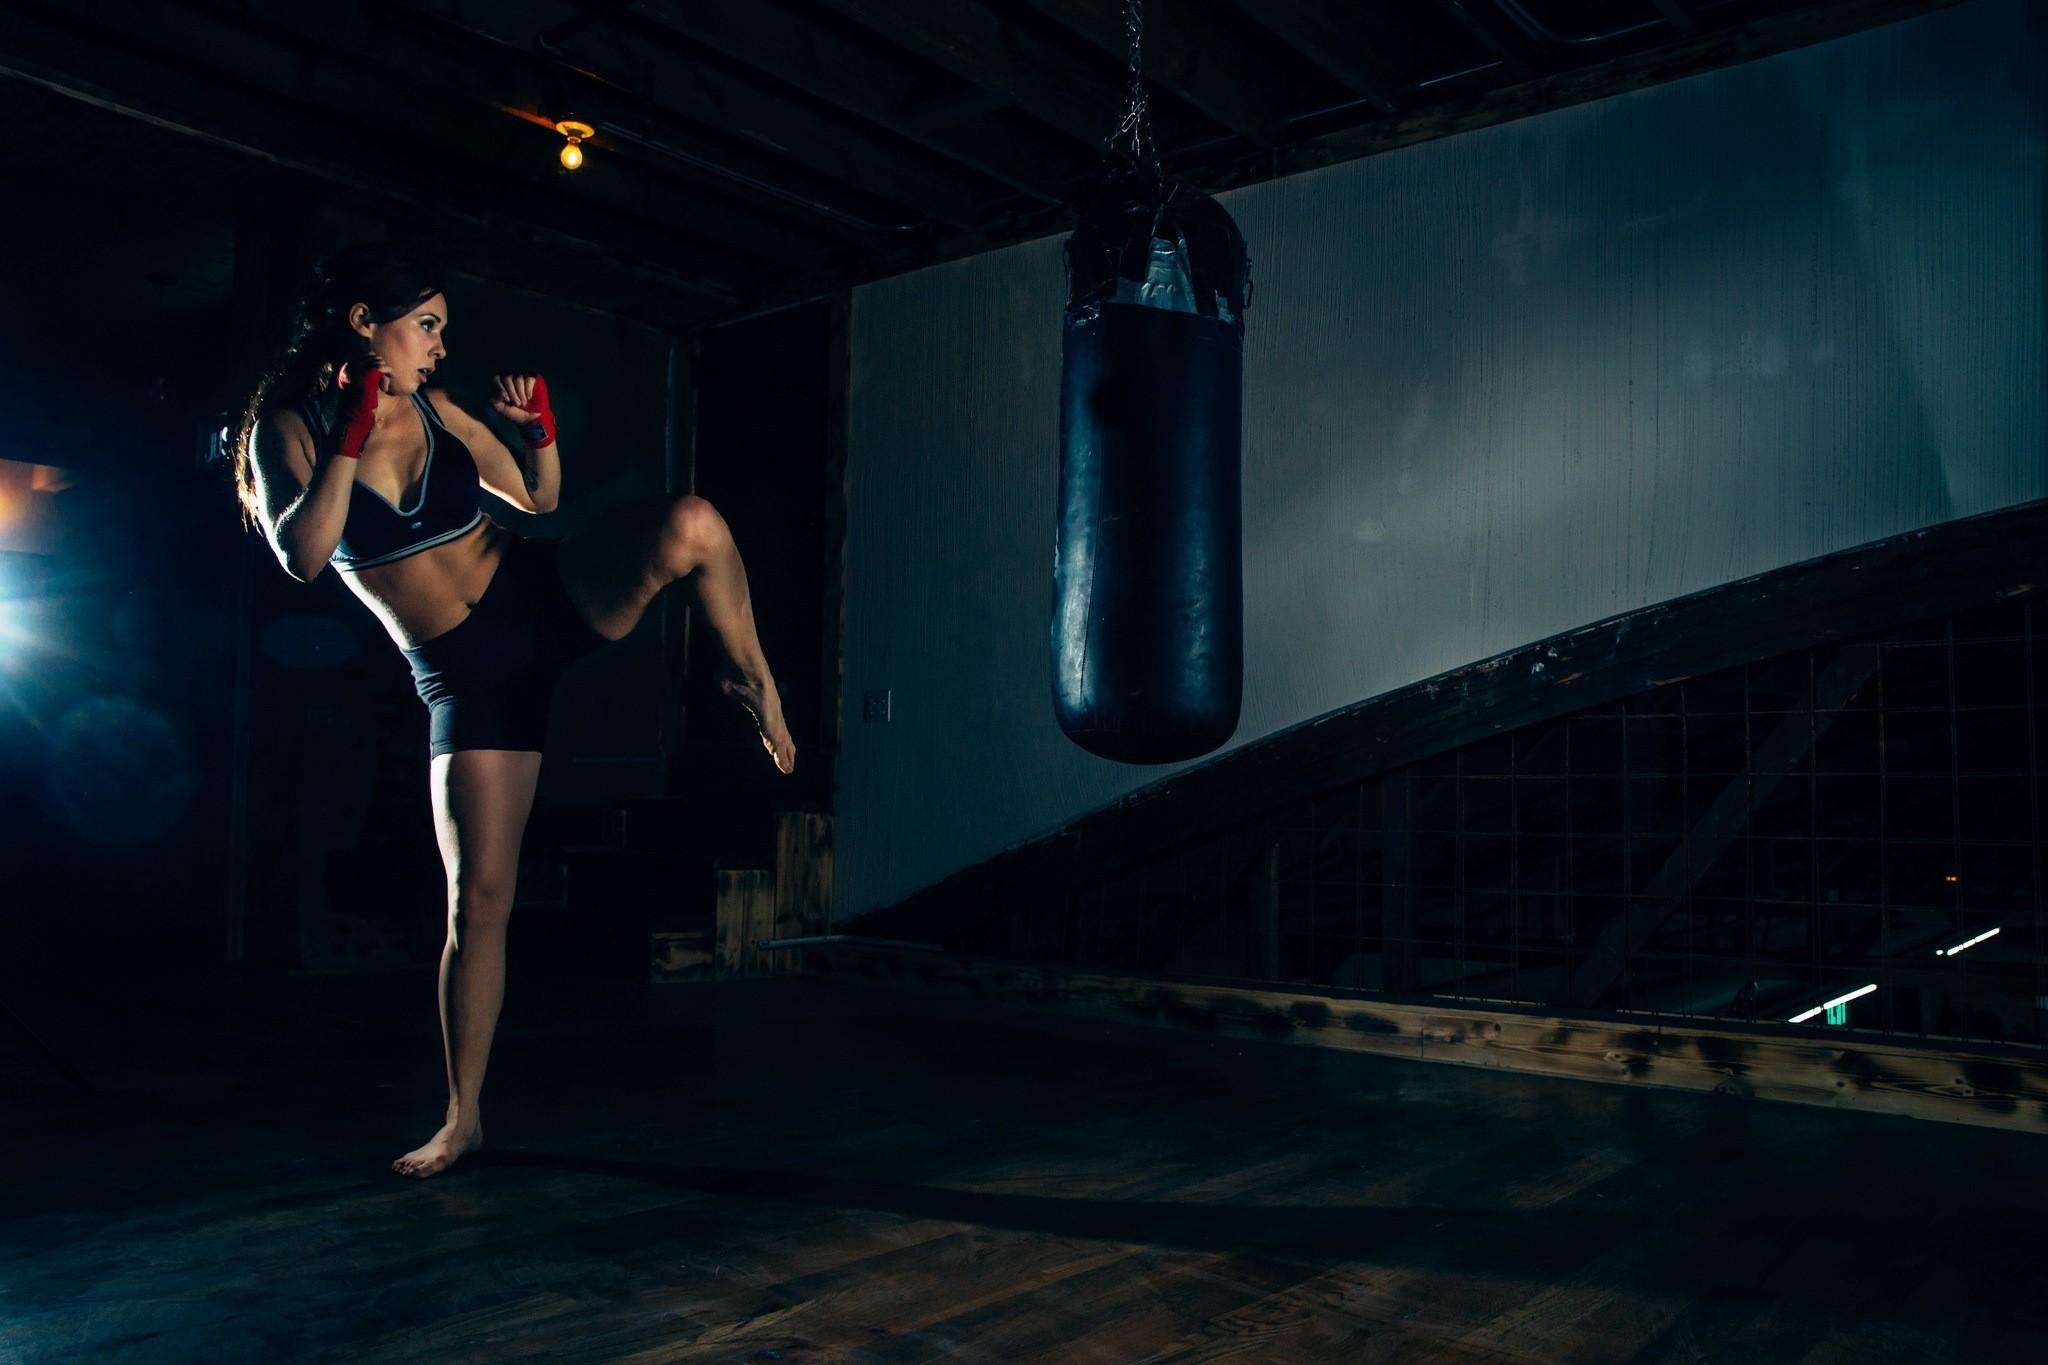 Wallpaper Sport Fitness: Wallpaper : Sports, Women, Night, Boxing, Kickboxing